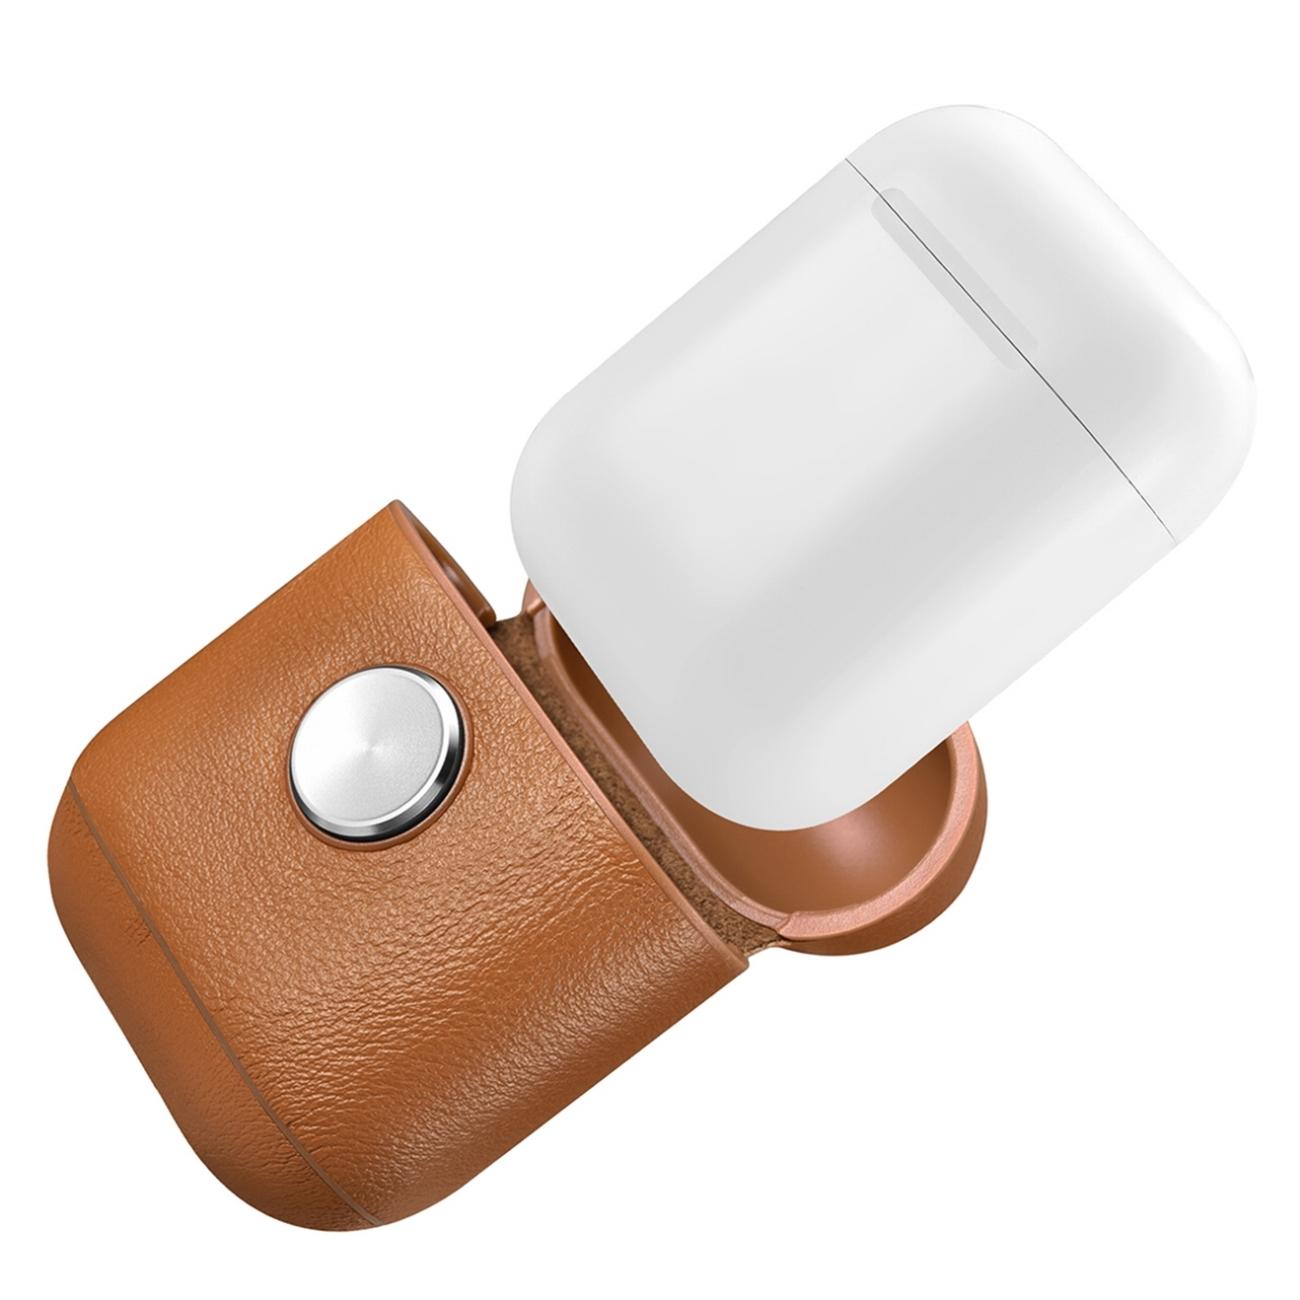 zenpod-fidget-spinner-airpod-case-air-vinyl-design-brown-silver-separation